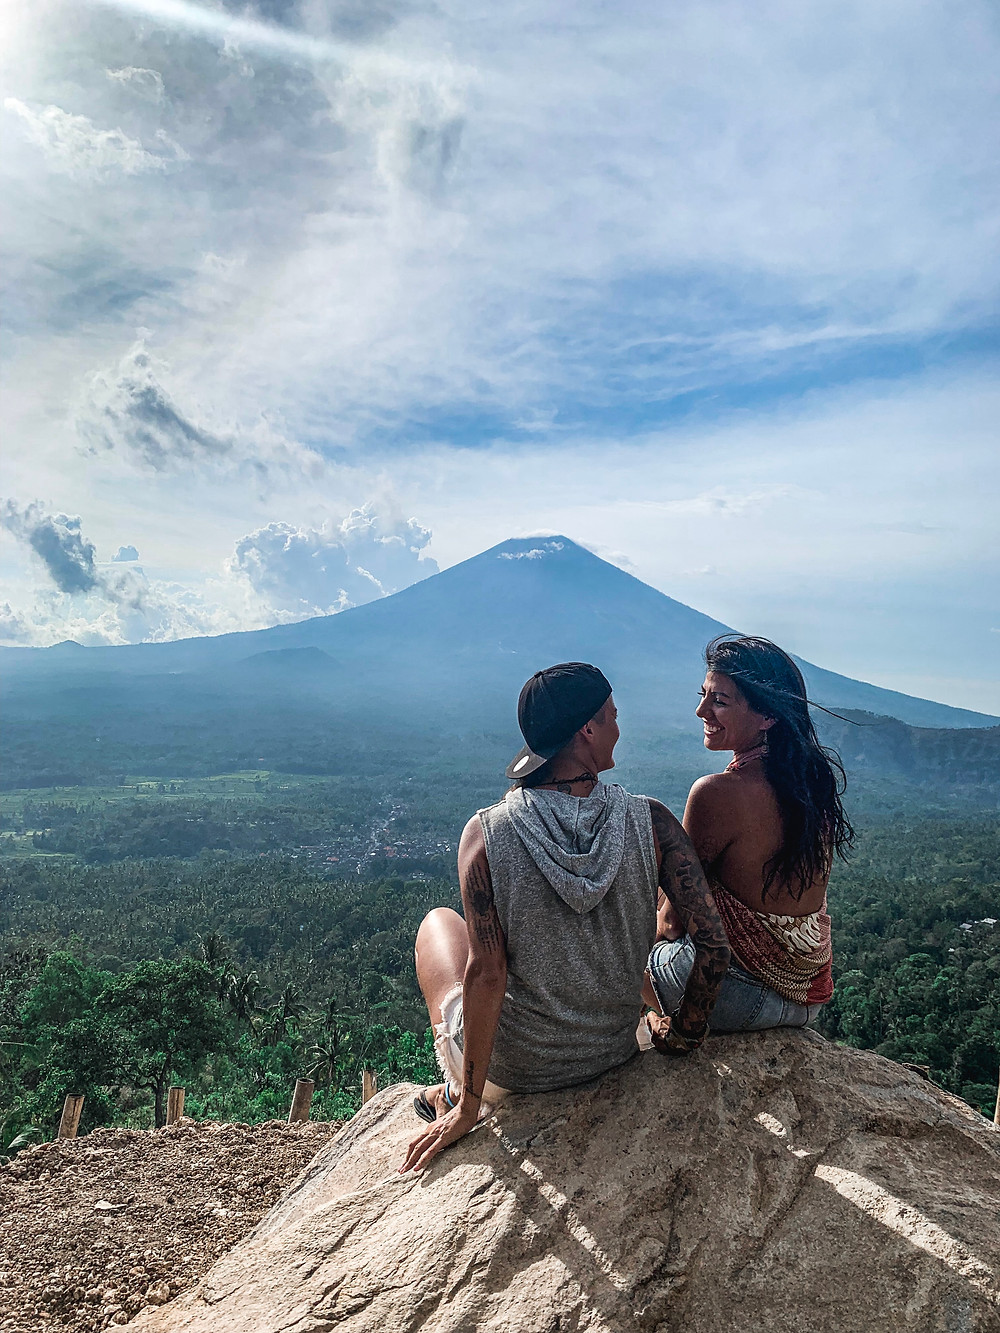 Mt Agung in Ubud, Bali | On Airplane Mode